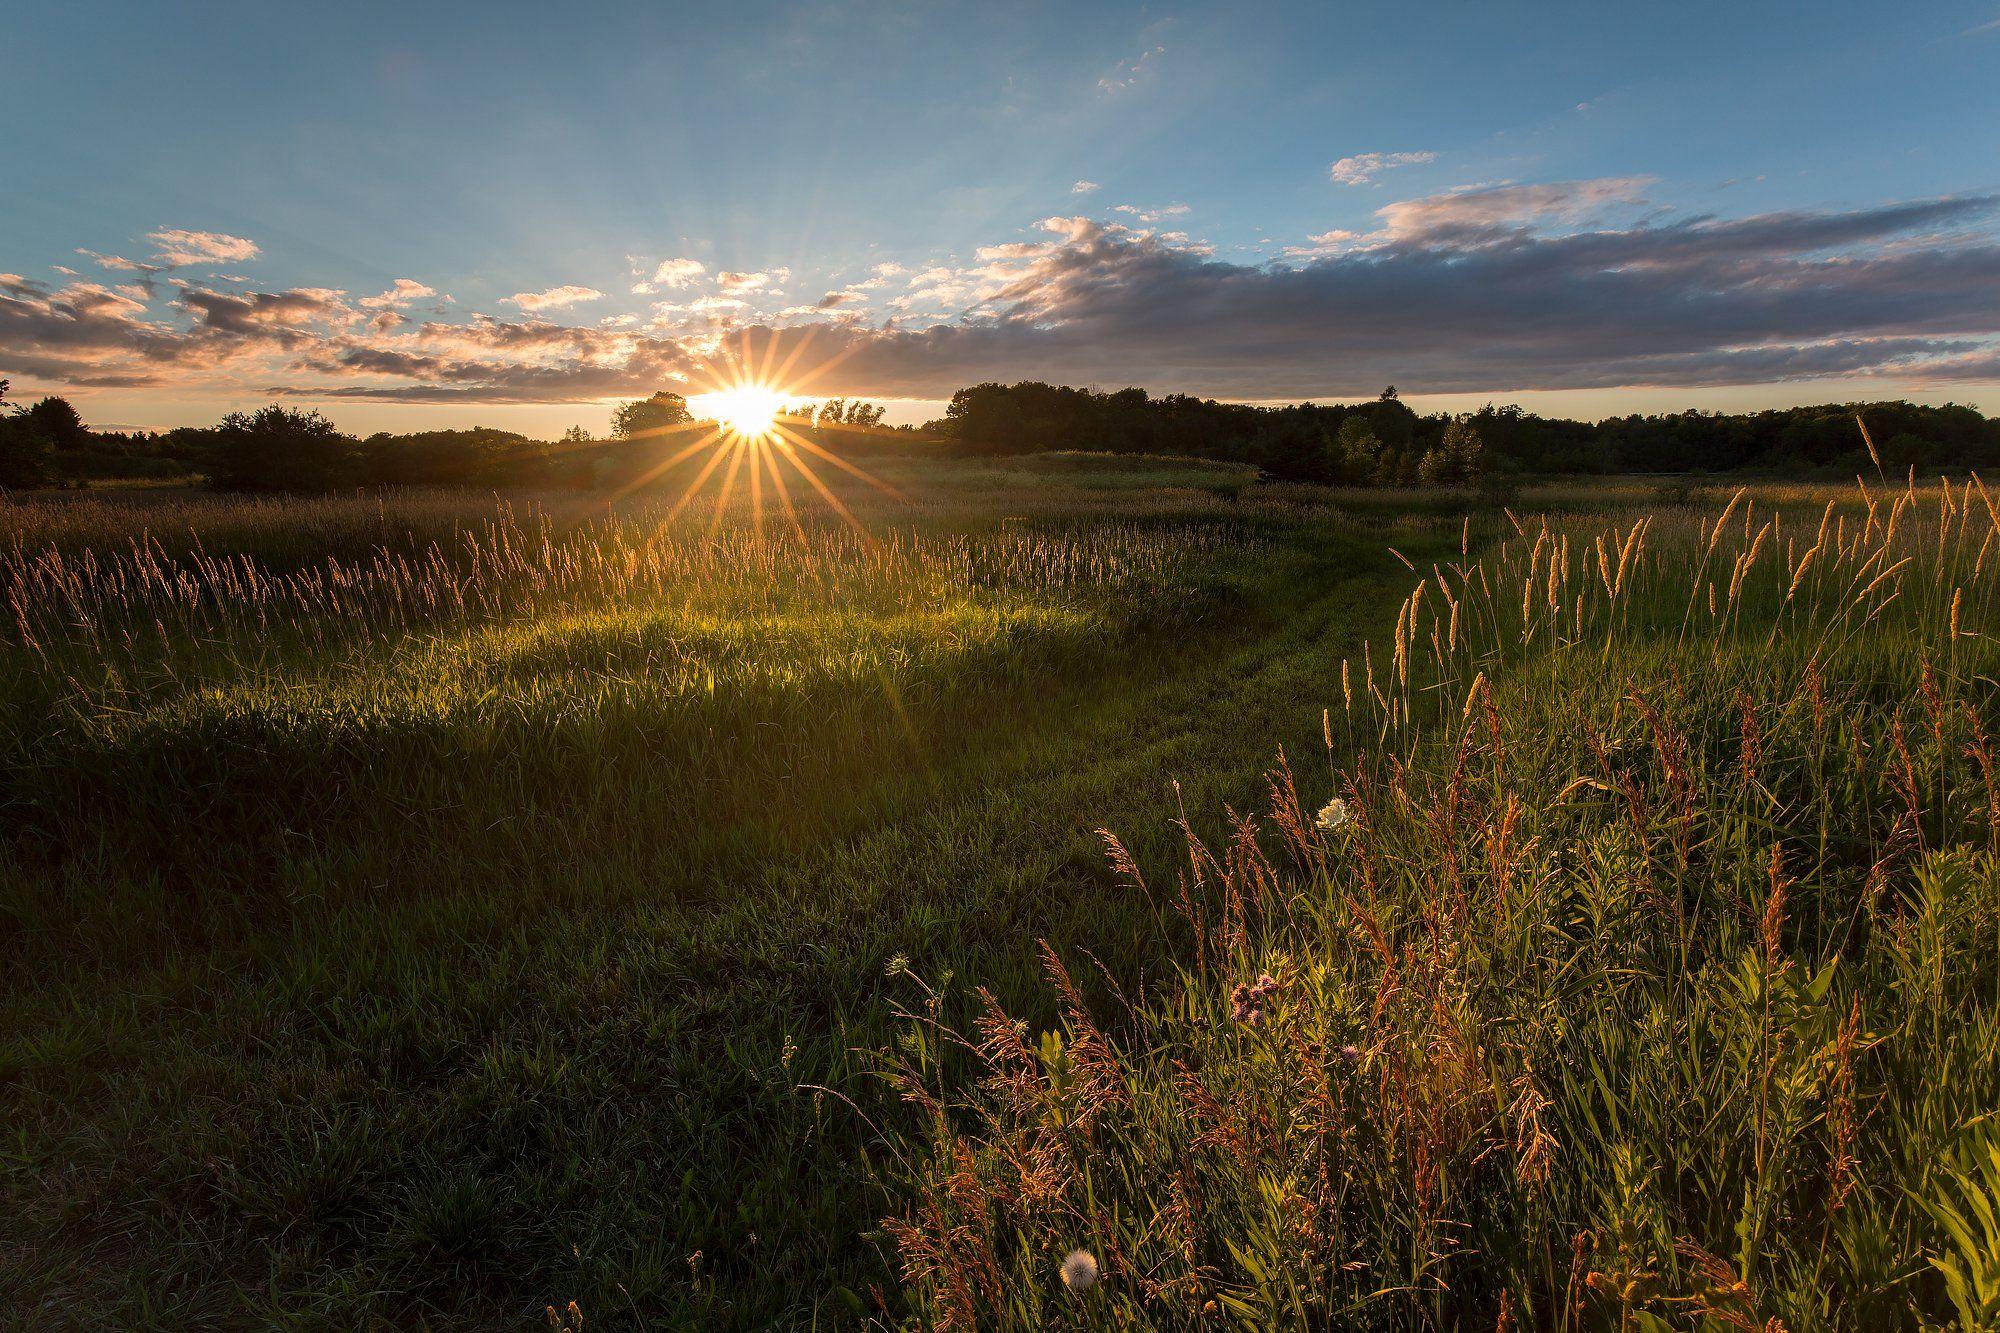 Clouds, Field, Sun, Sunset, Закат,, Облака,, Поле,, Солнце,, G A S